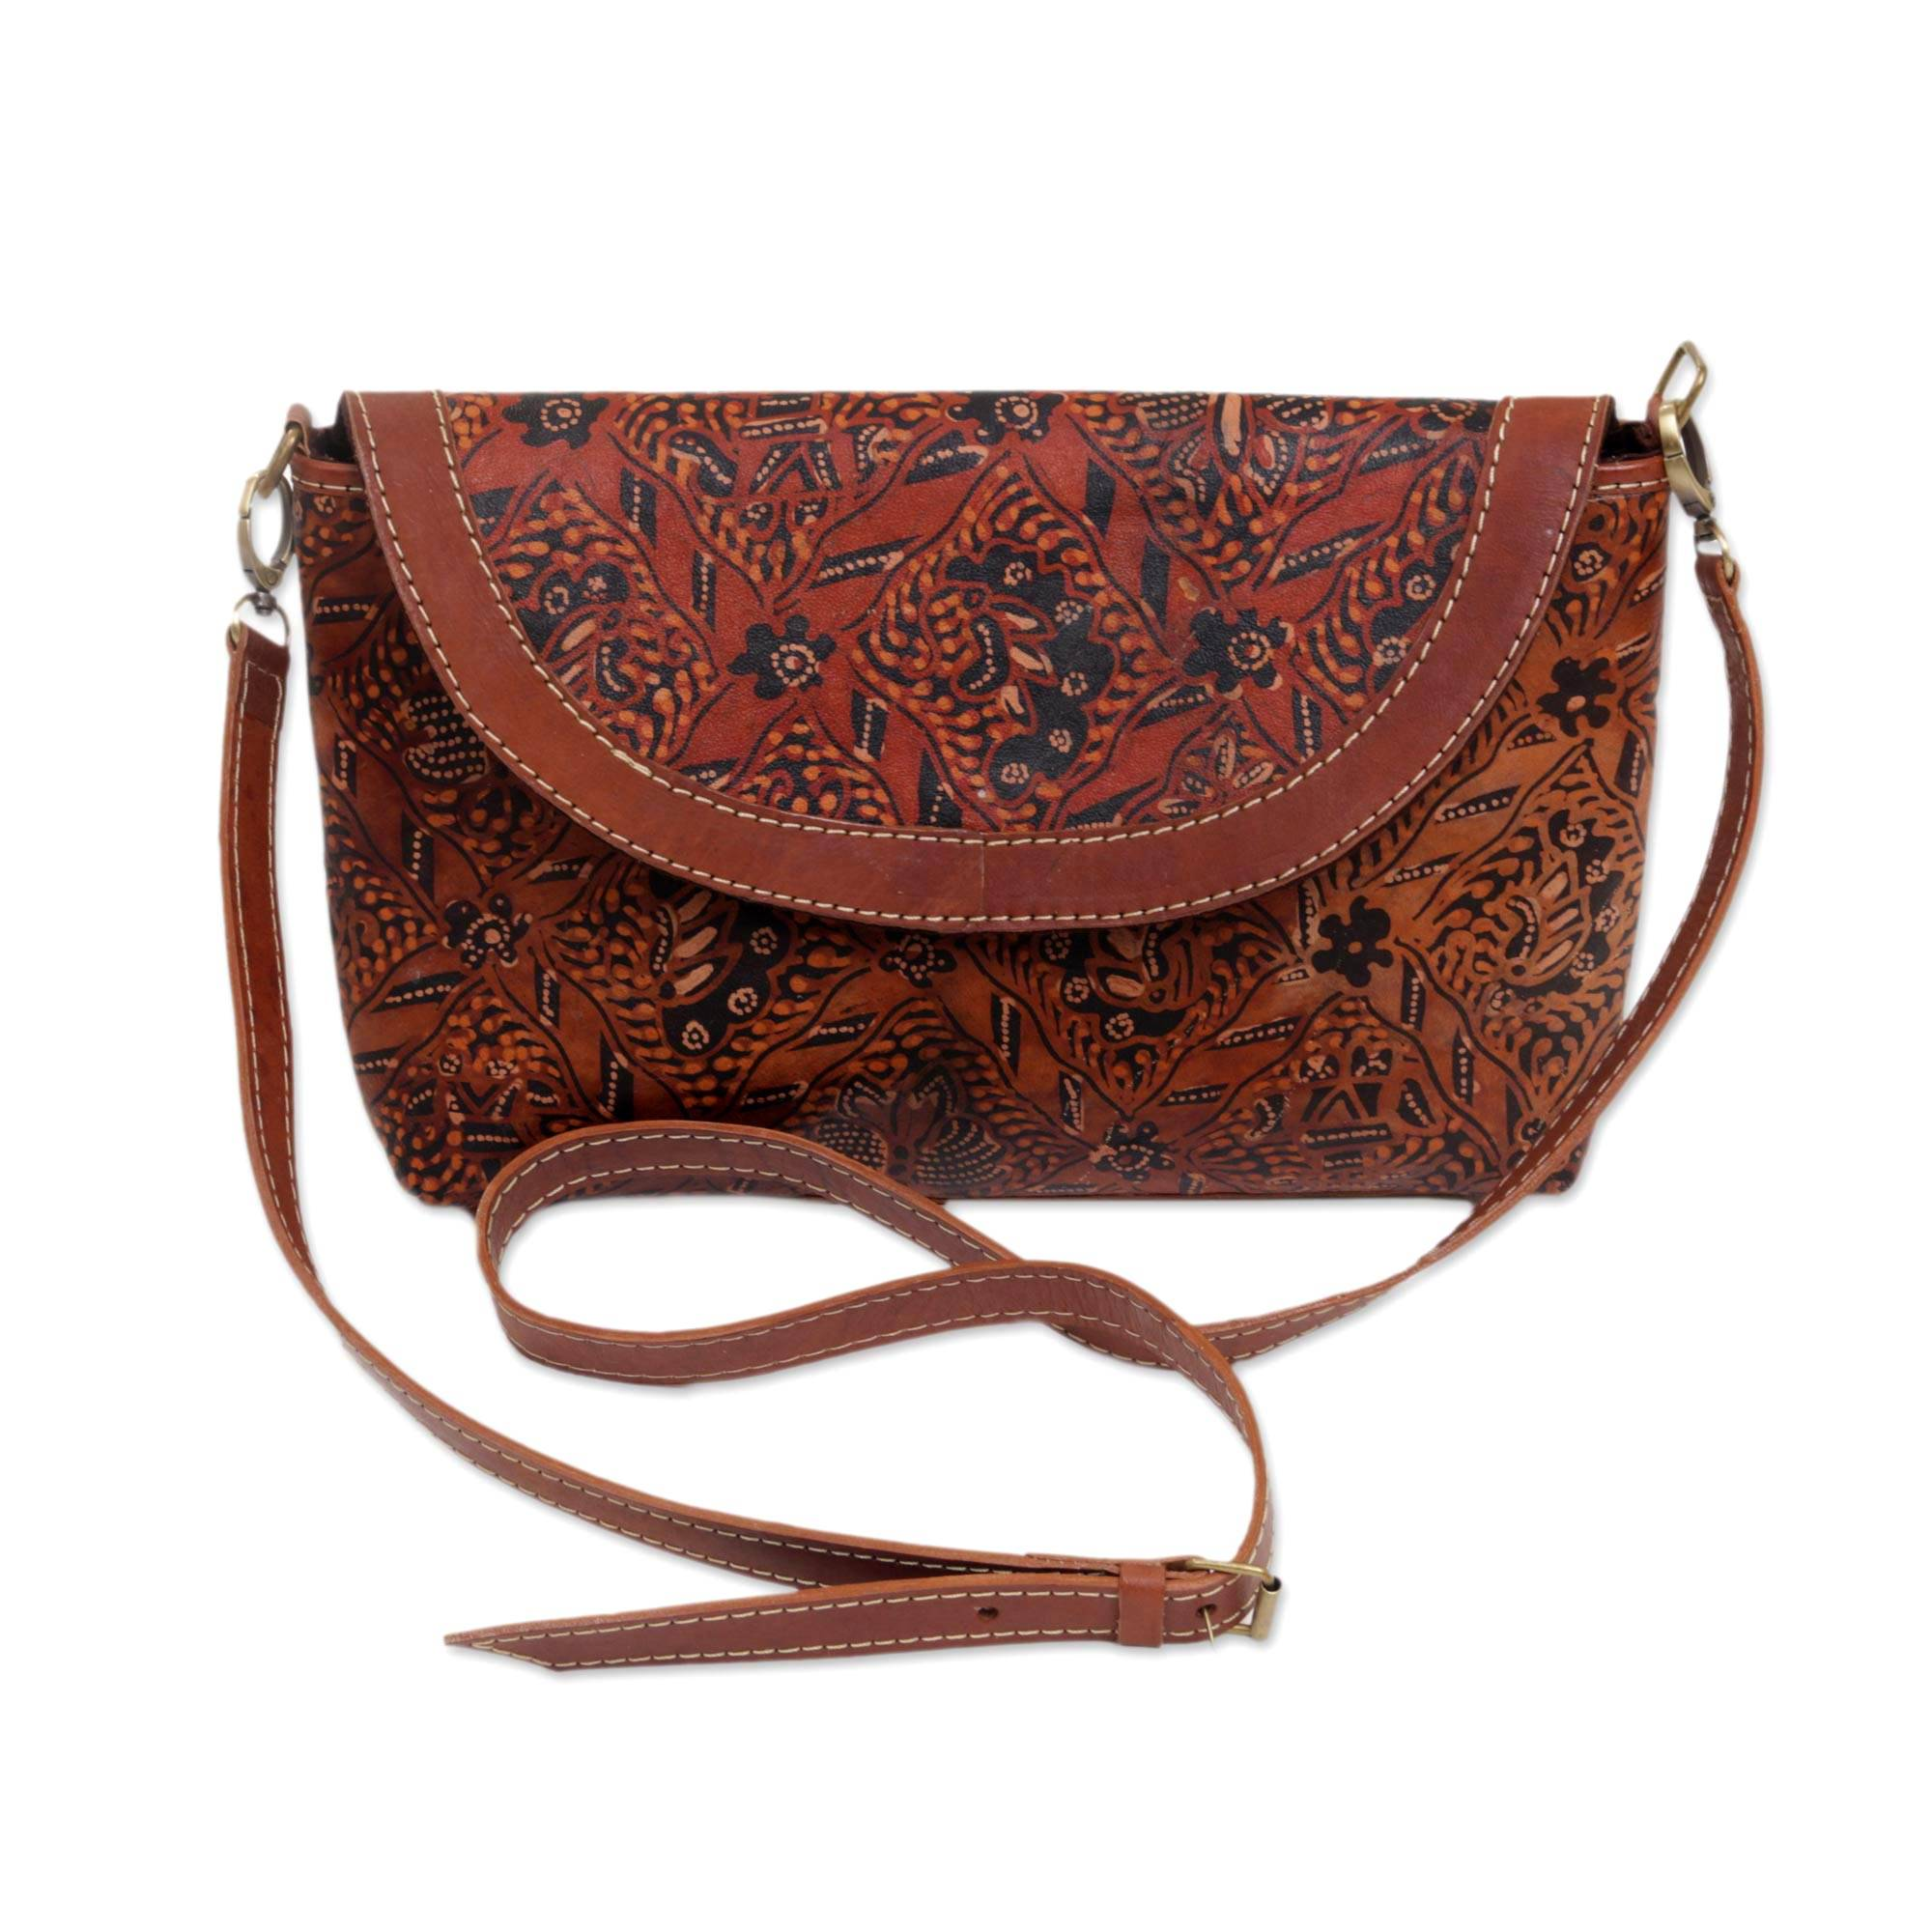 Harga Dan Spek Bulk Whole Handmade Sling Bag Cross Body In D Island Sandal Nippers Puyu Leather Cokelat Tua Batik With Long Adjustable Strap Floral Allure